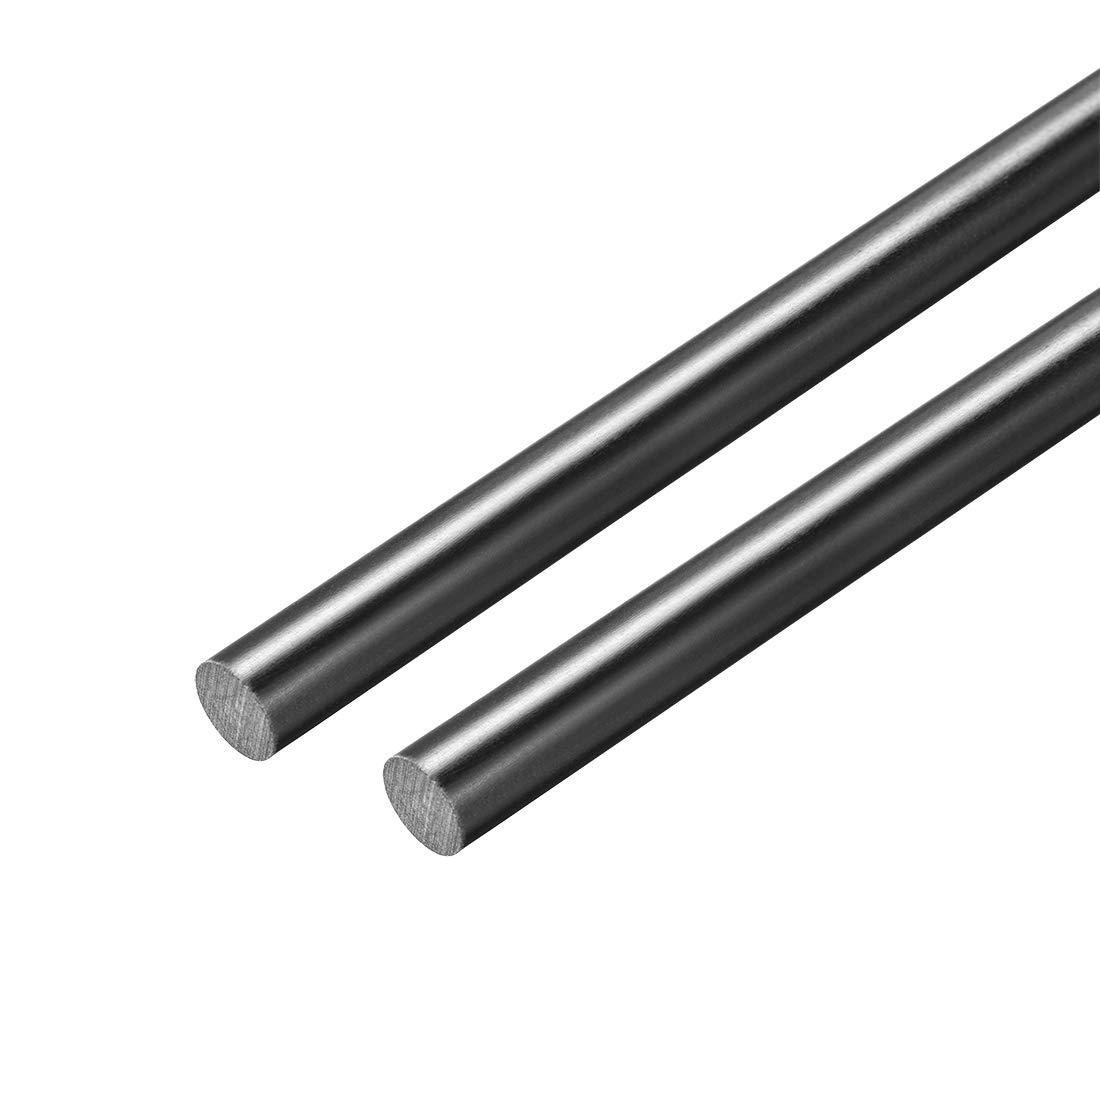 uxcell Plastic Round Rod,3//16 inch Dia 20 inch Length,Black FRP Fiberglass Round Rod Engineering Plastic Bar